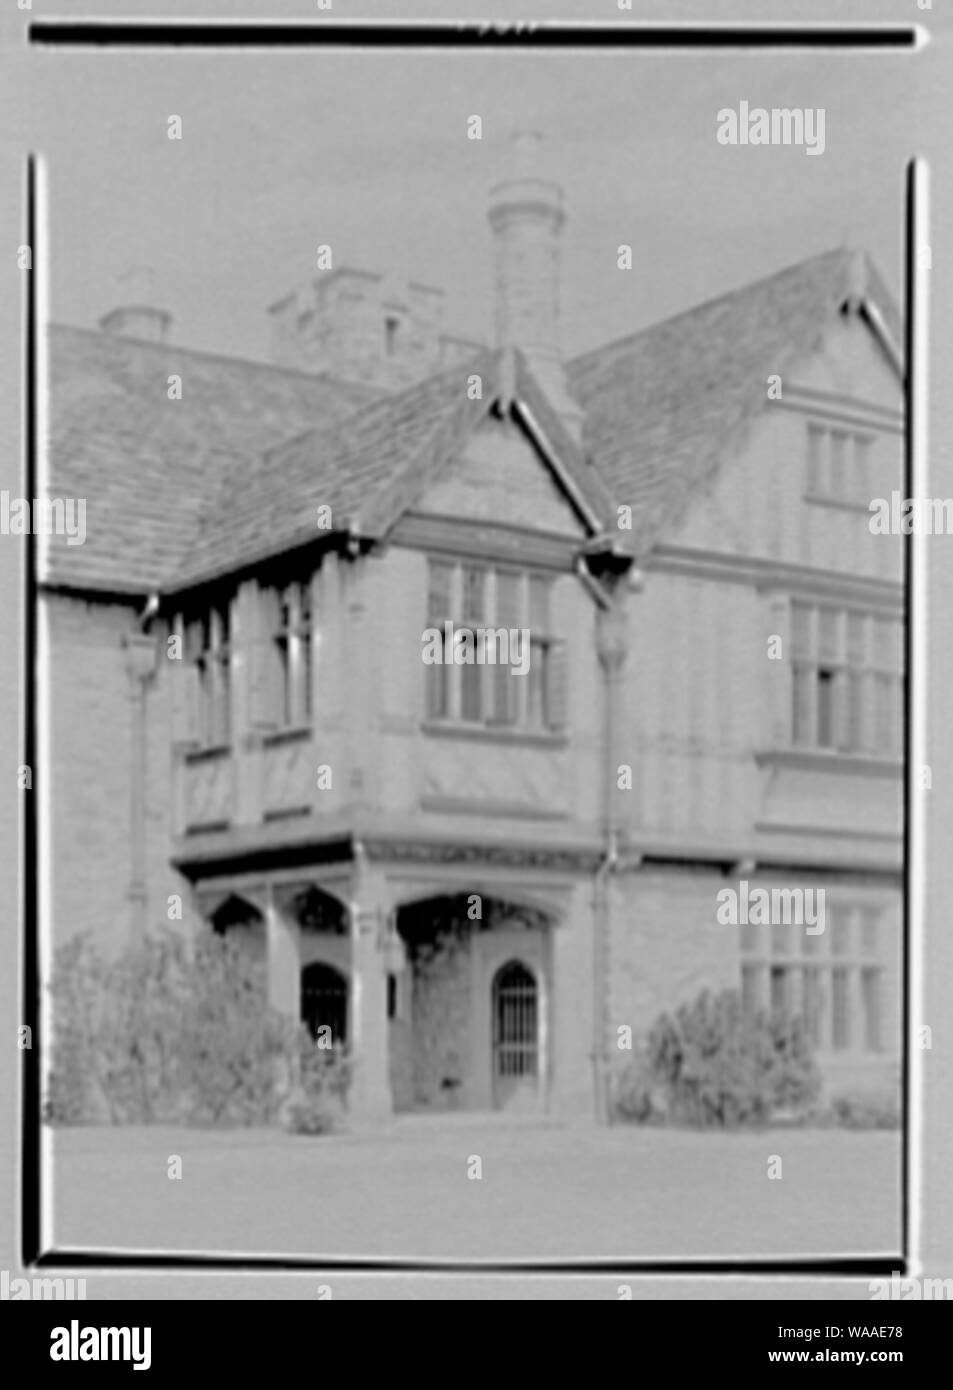 Clarence McK. Lewis, Skylands Farm, residence in Sterlington, New York. Stock Photo